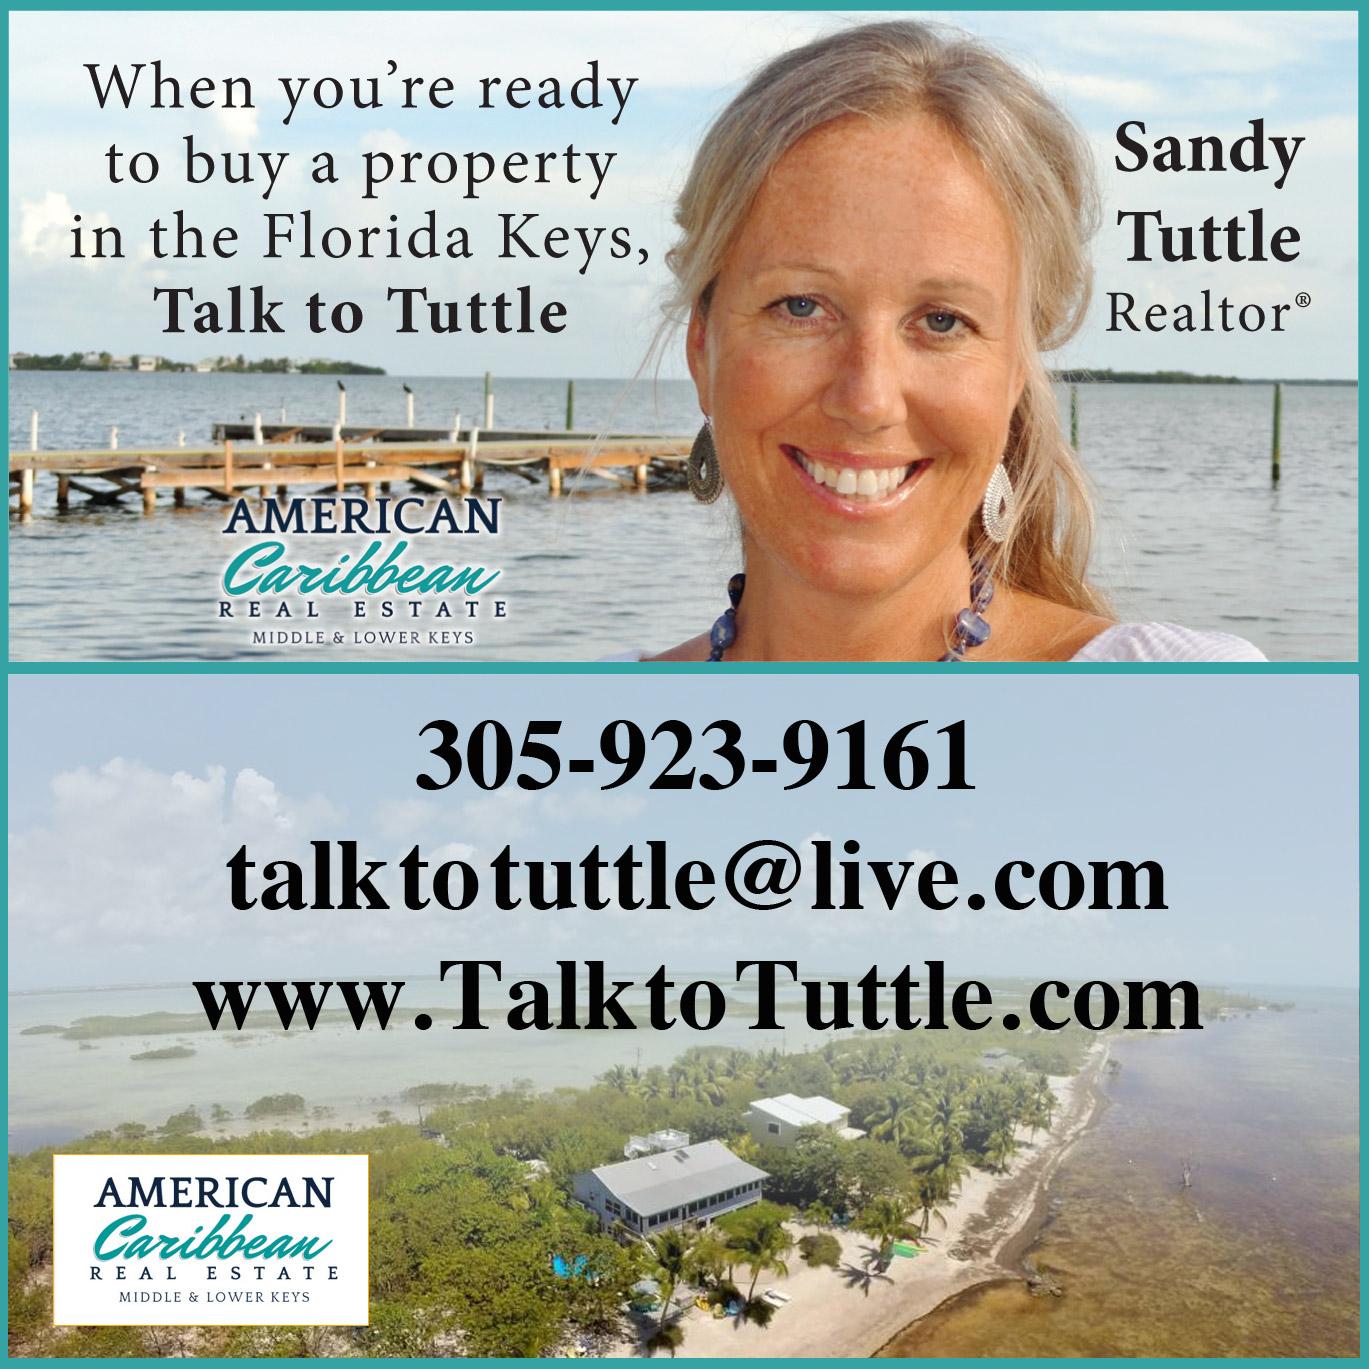 Sandy Tuttle